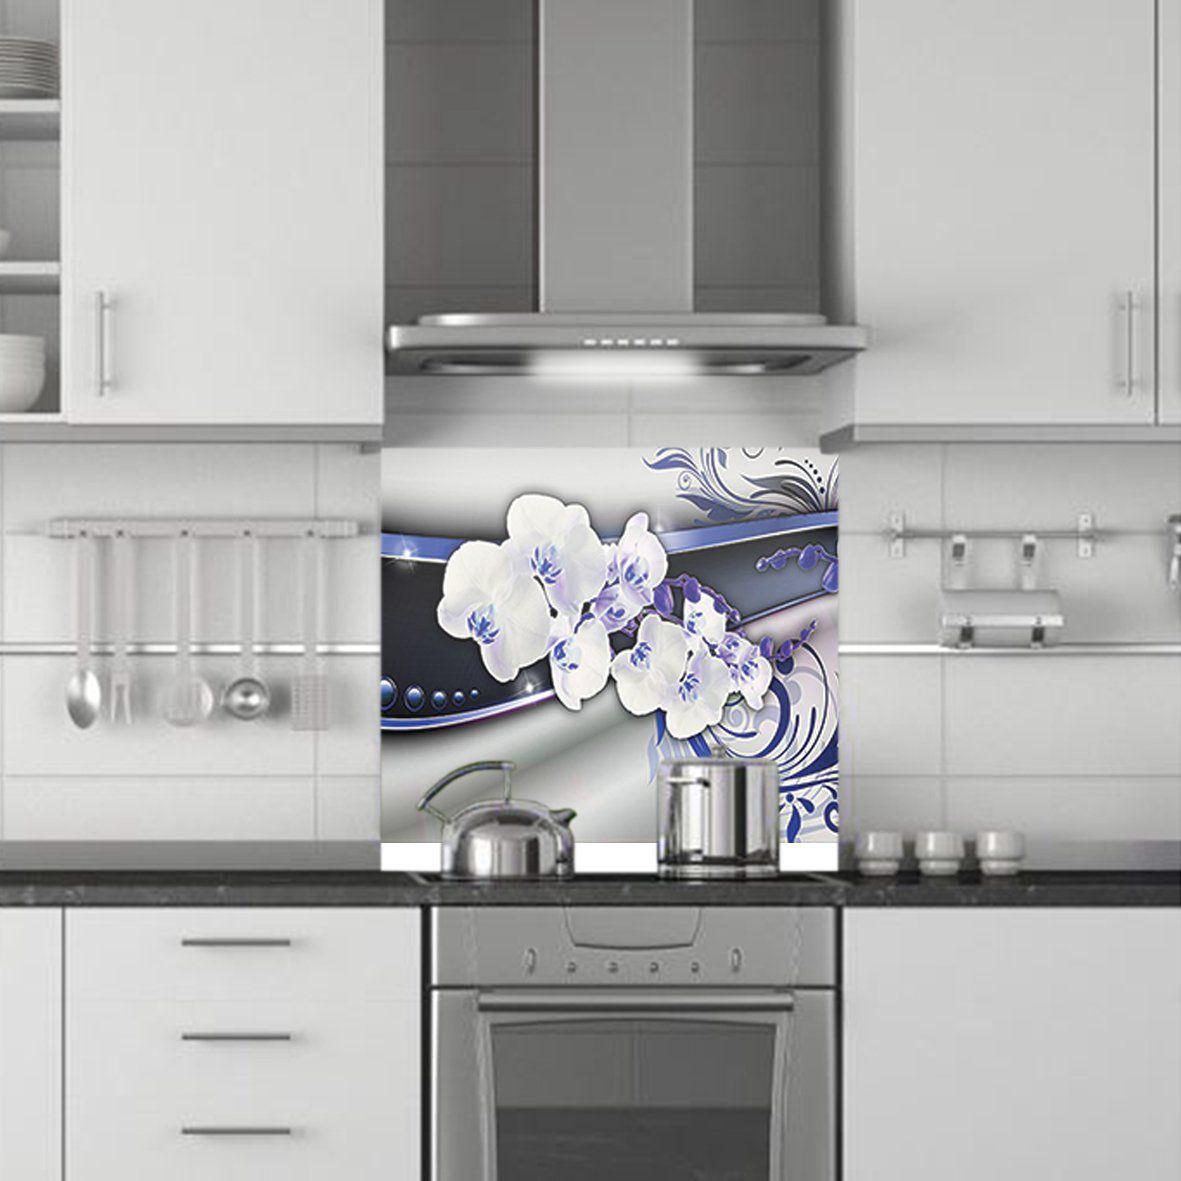 Cr dence de cuisine d corative orchidees - Credence decorative cuisine ...